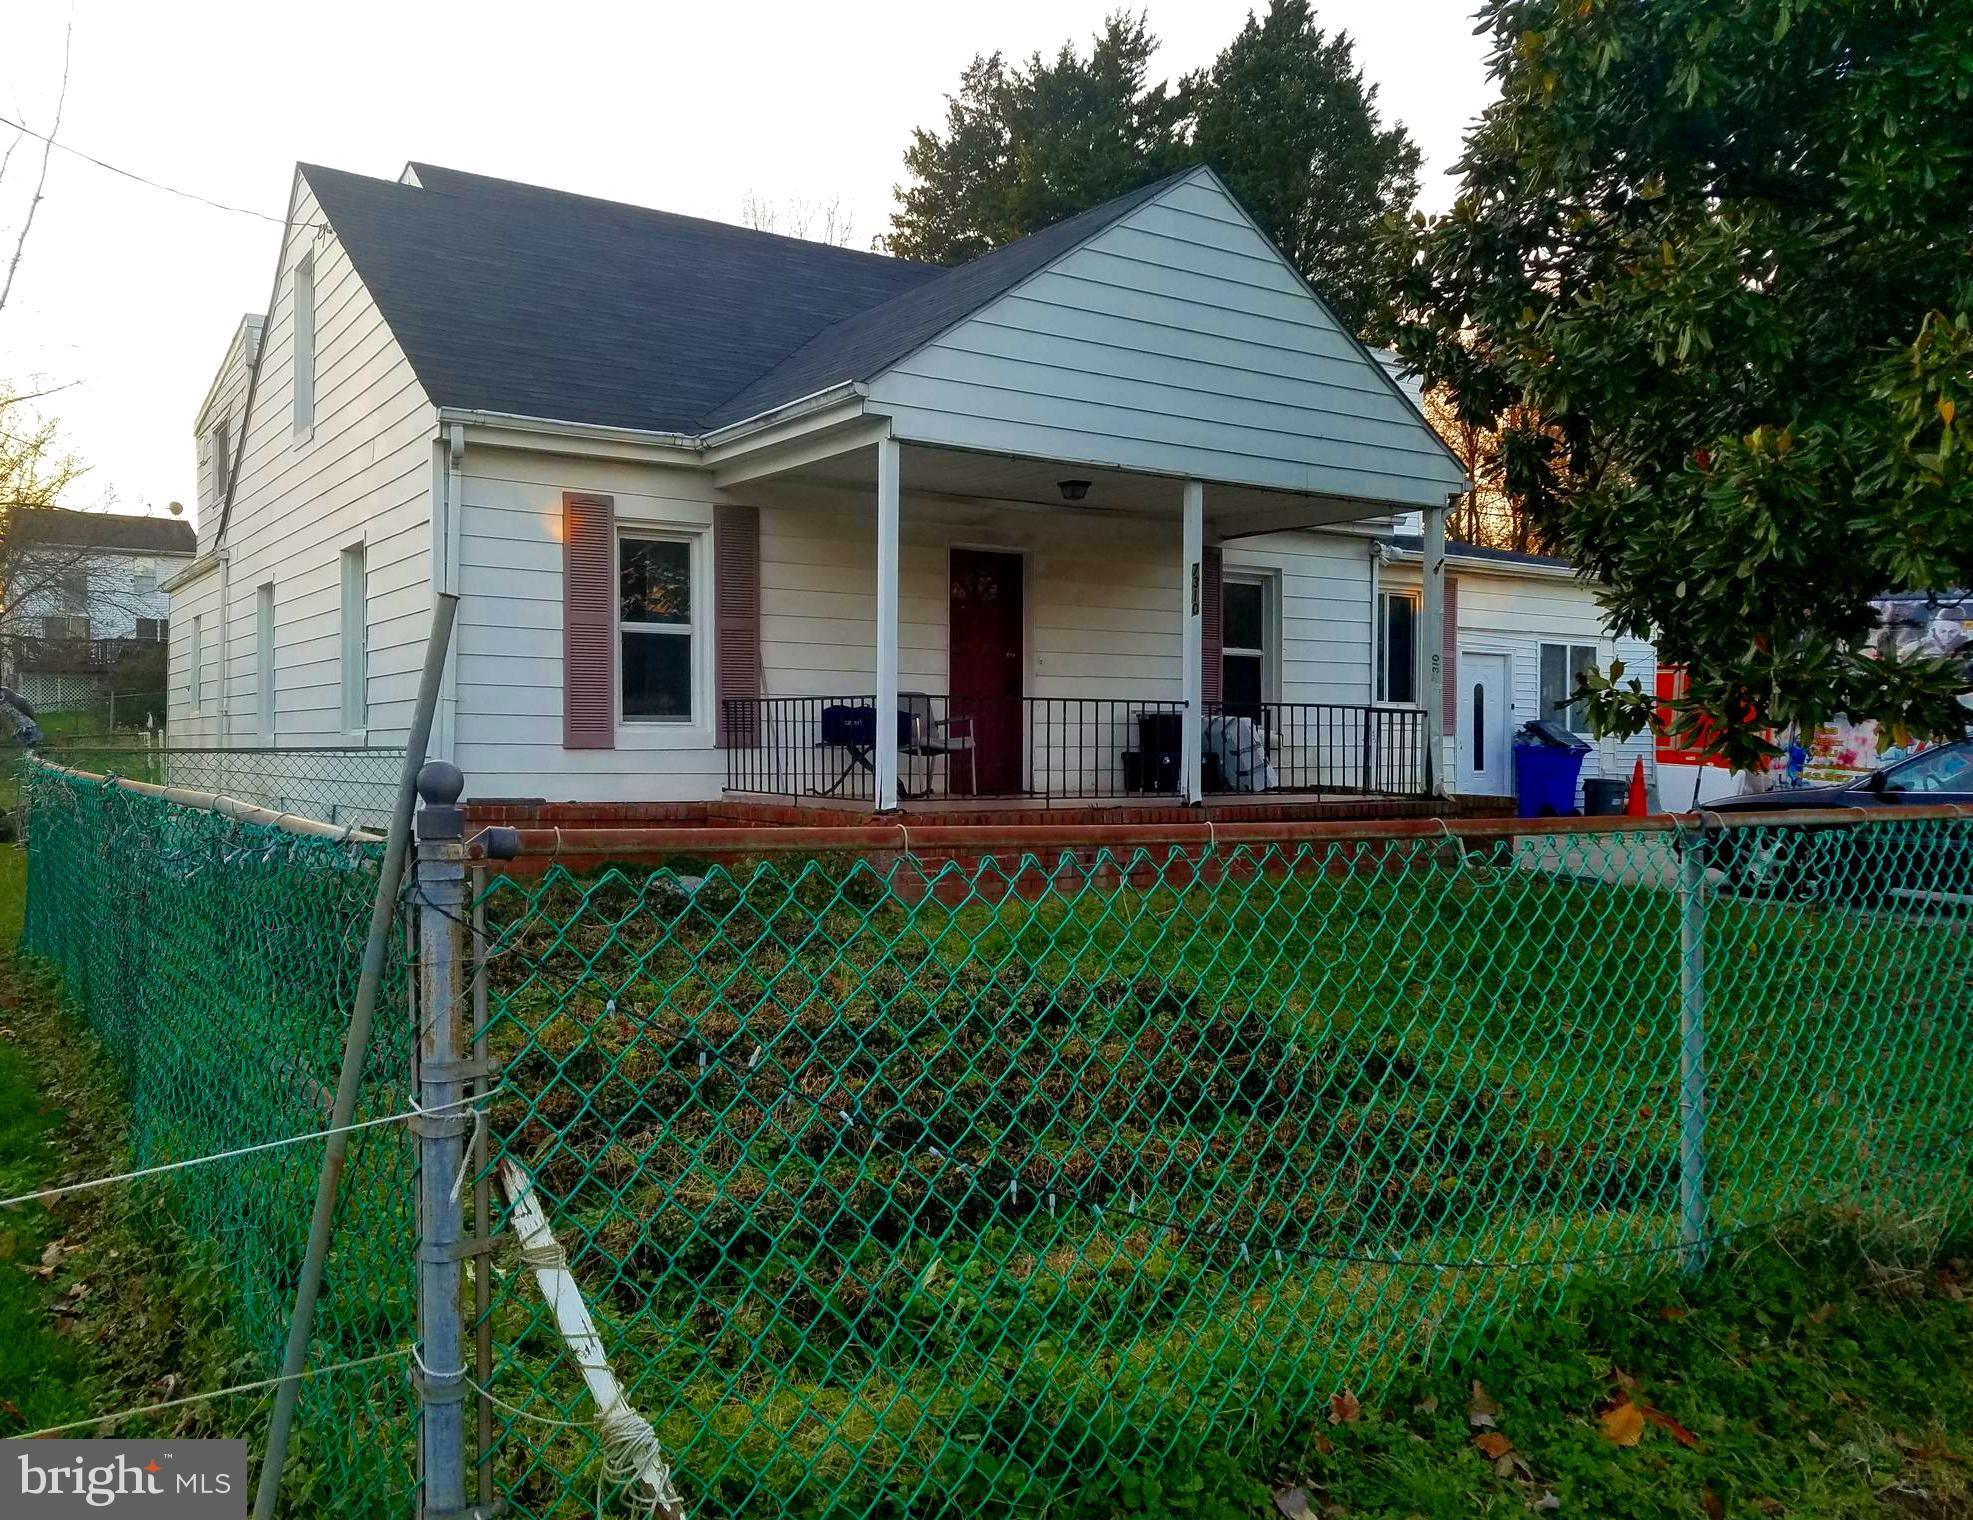 7310 Wye Ave, Jessup, MD, 20794